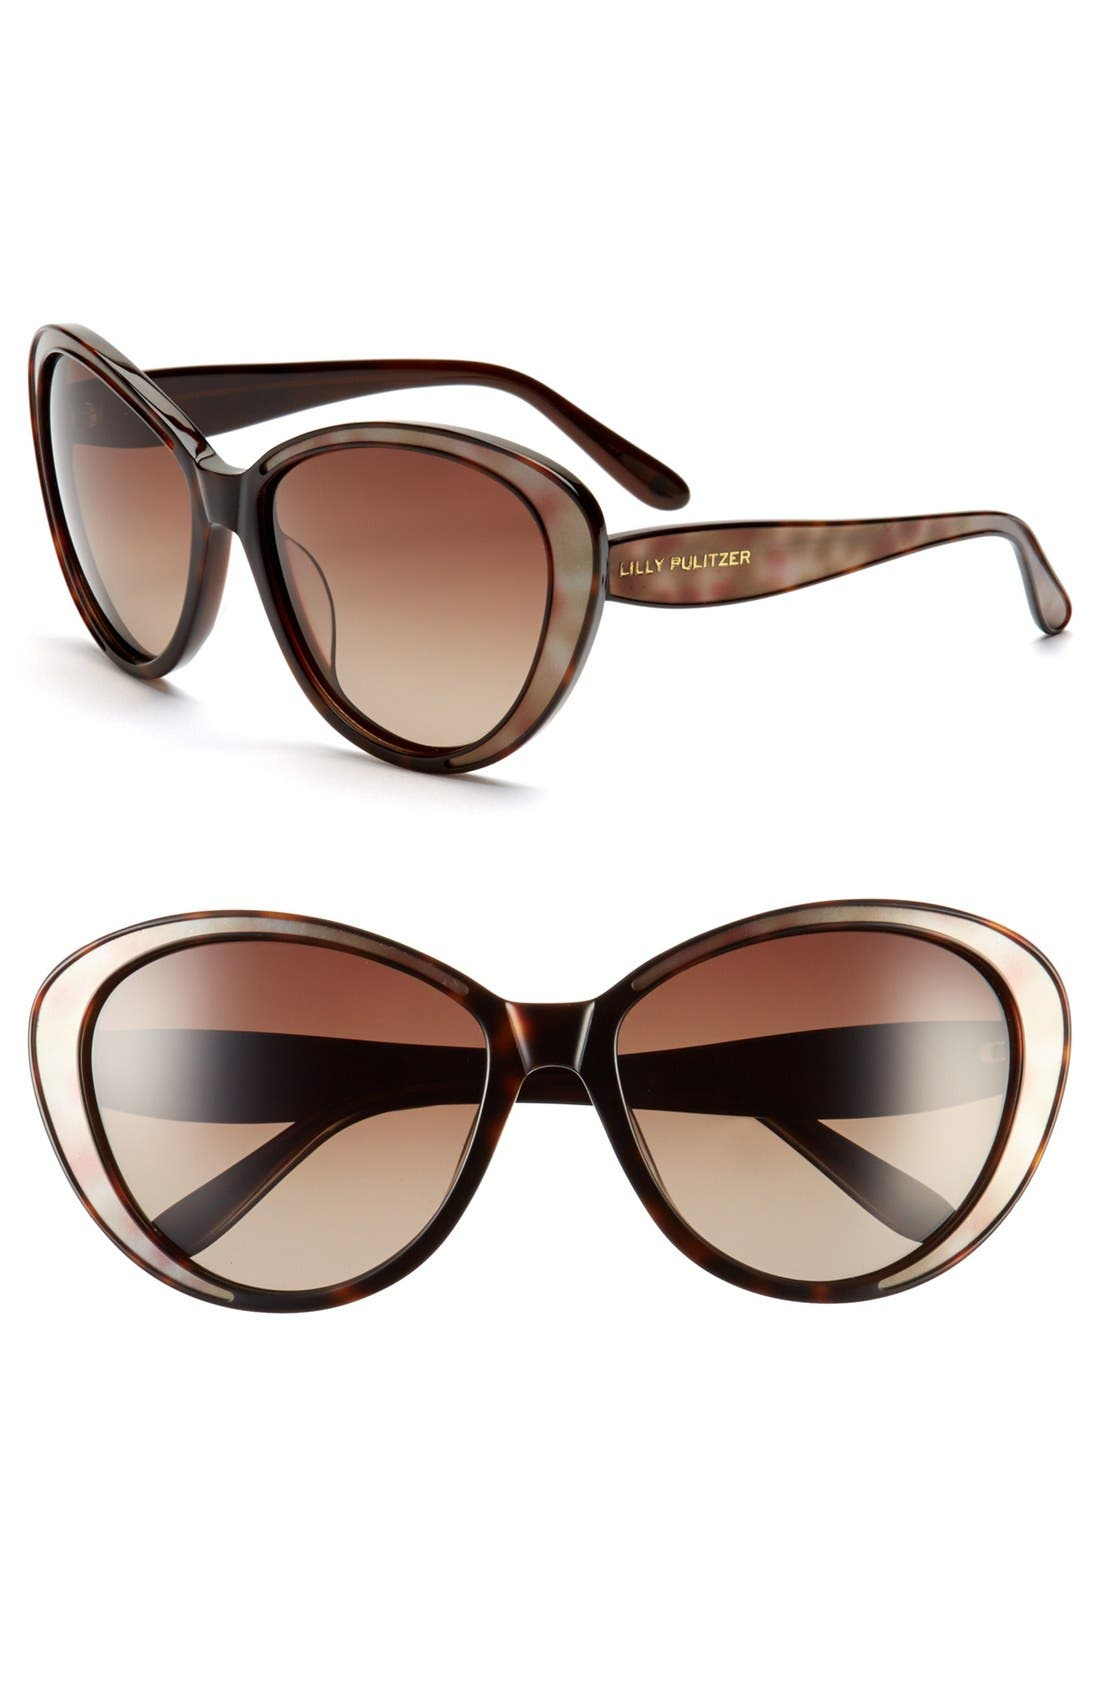 Main Image - Lilly Pulitzer® 'Mae' 60mm Polarized Sunglasses